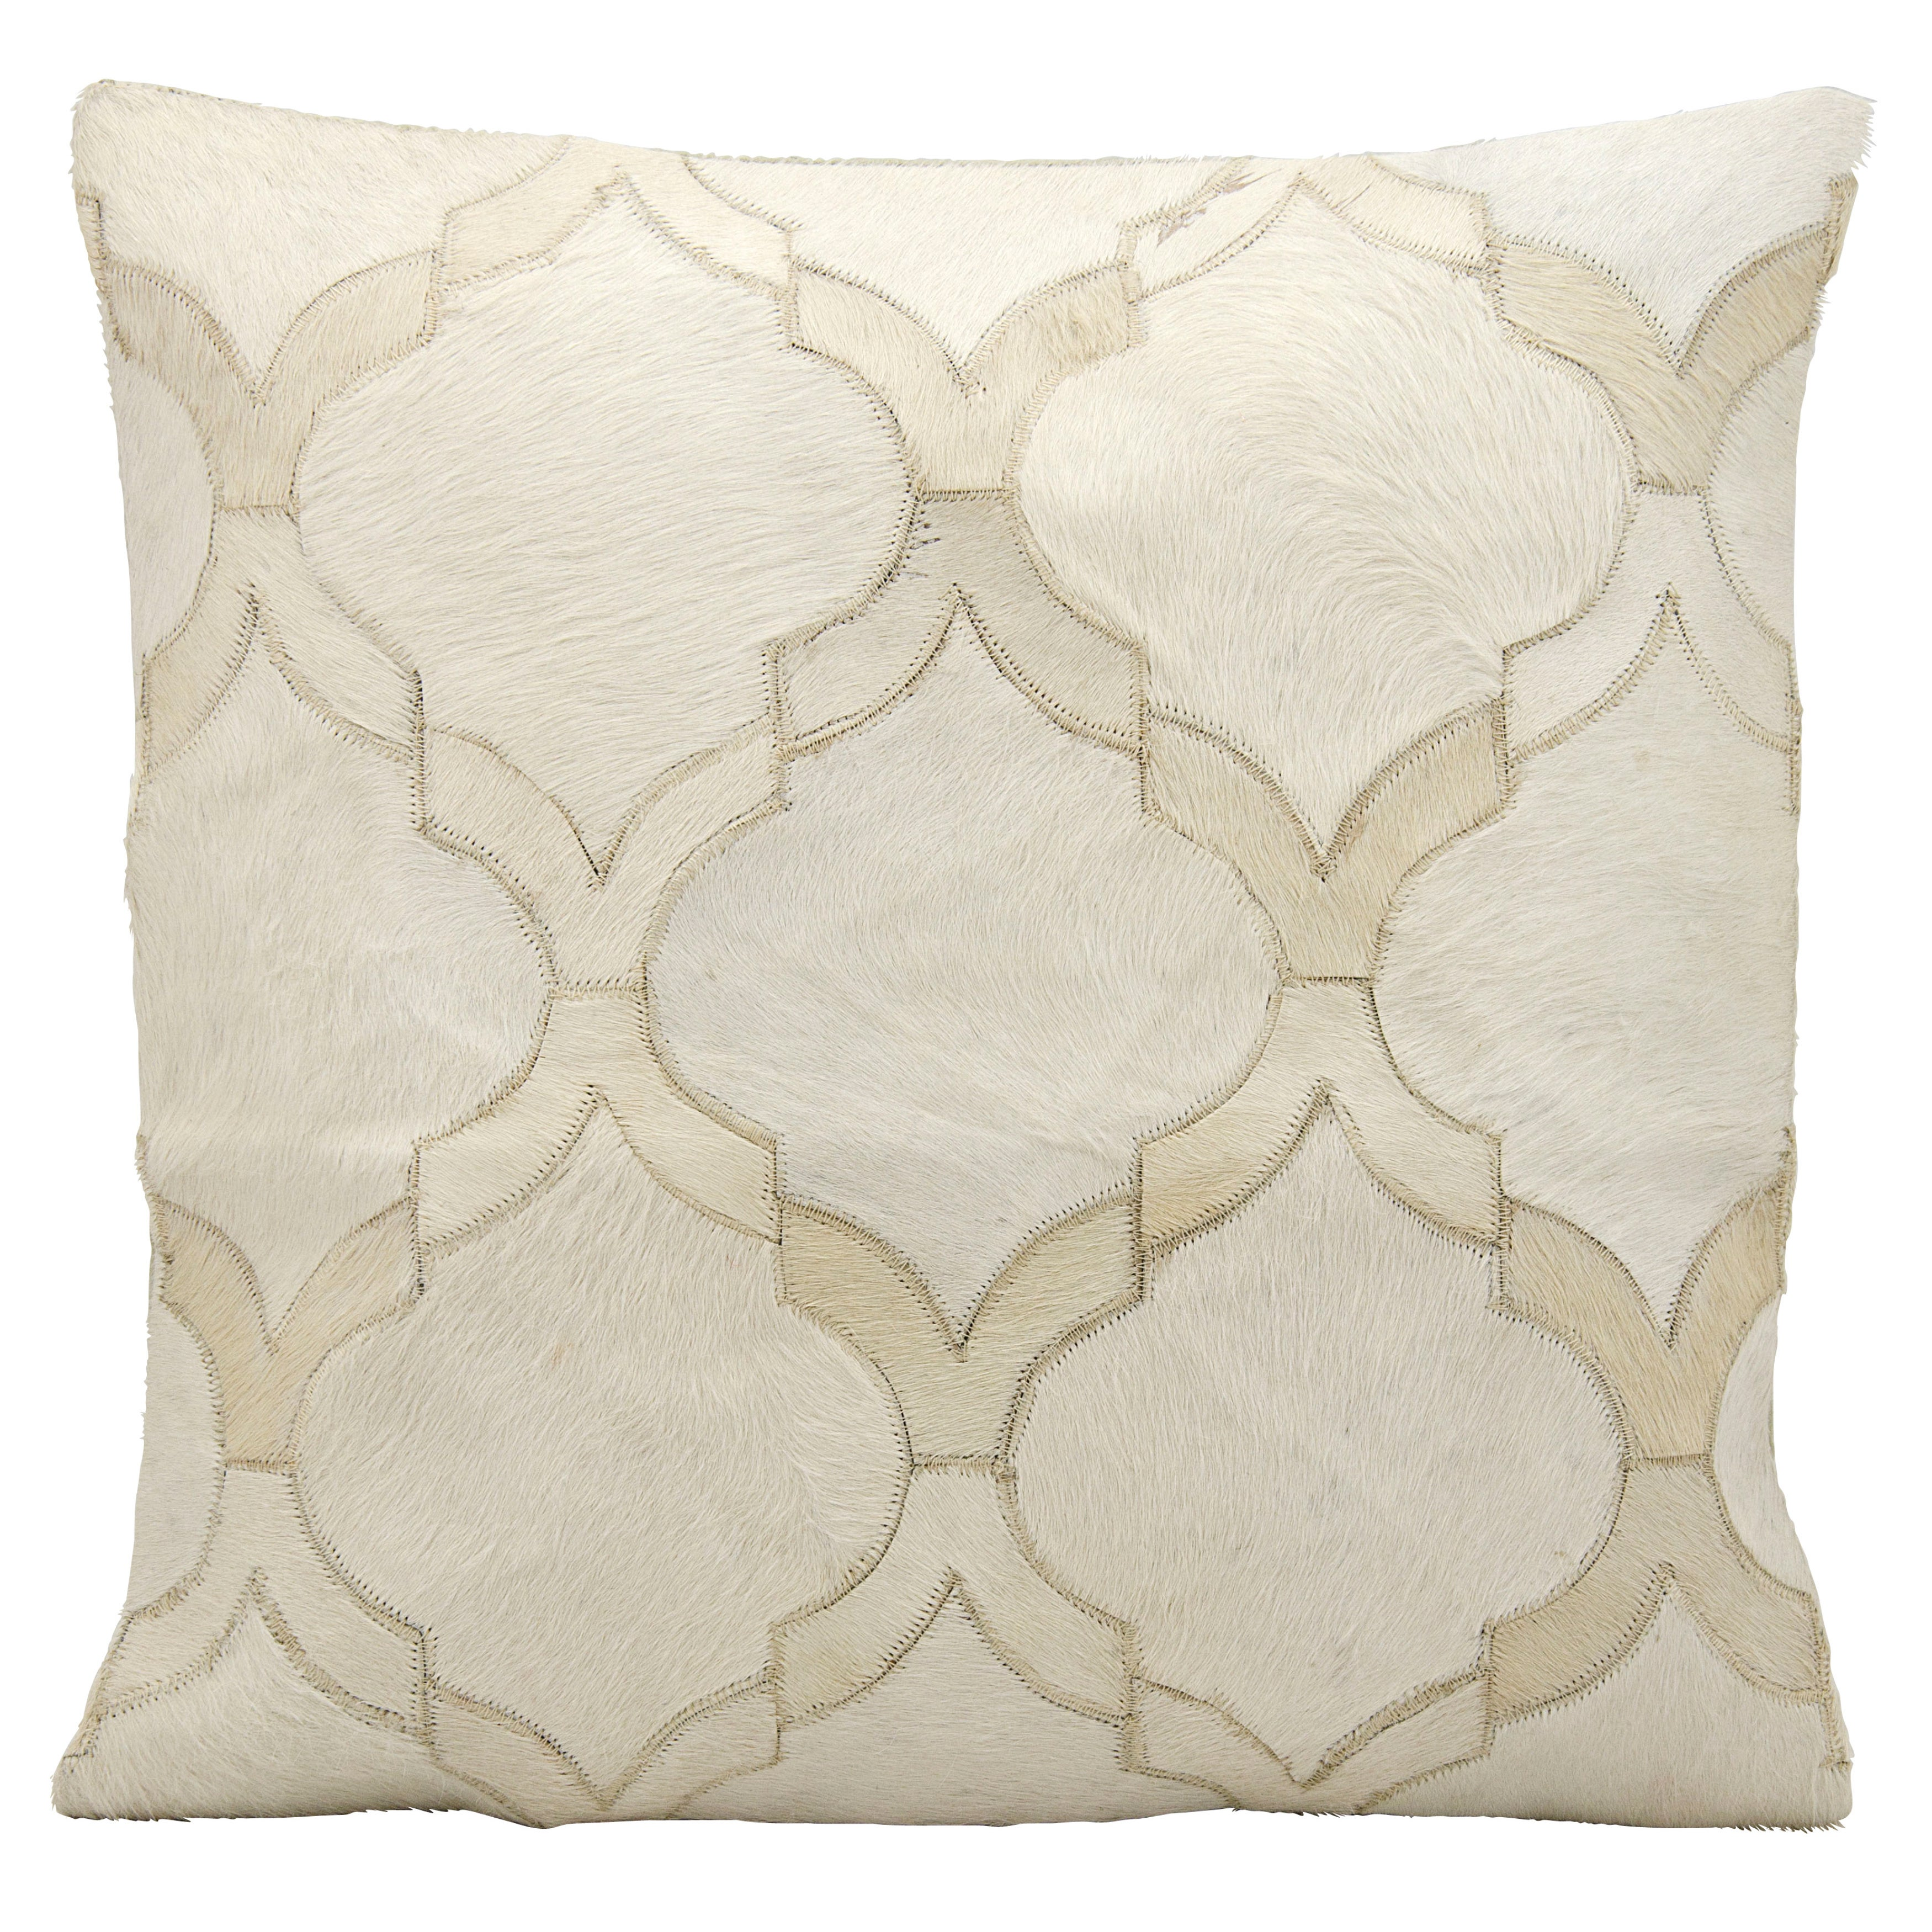 Nourison Mina Victory Mina Victory M879 White Decorative Pillow 20 X 20